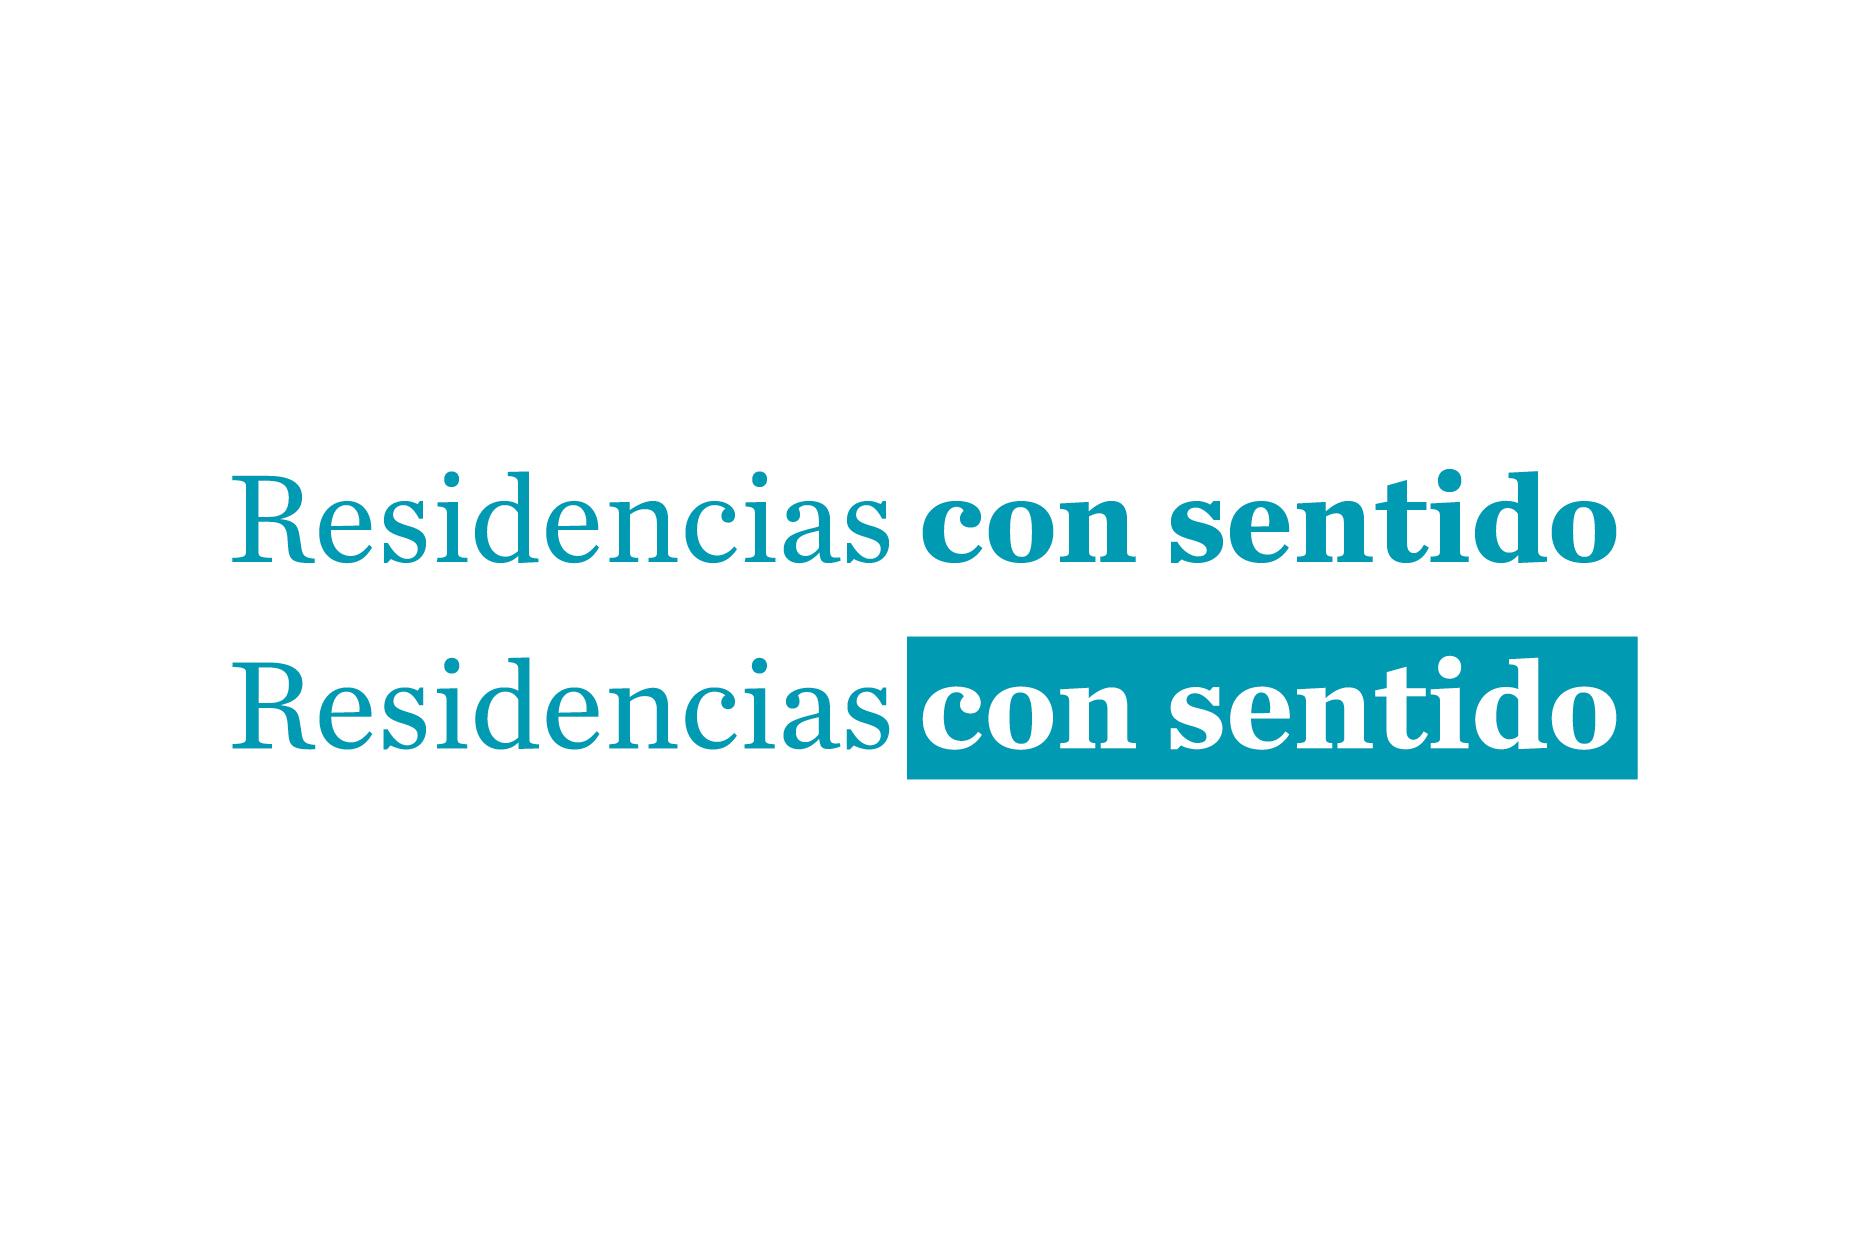 residencias con sentido_web2.jpg